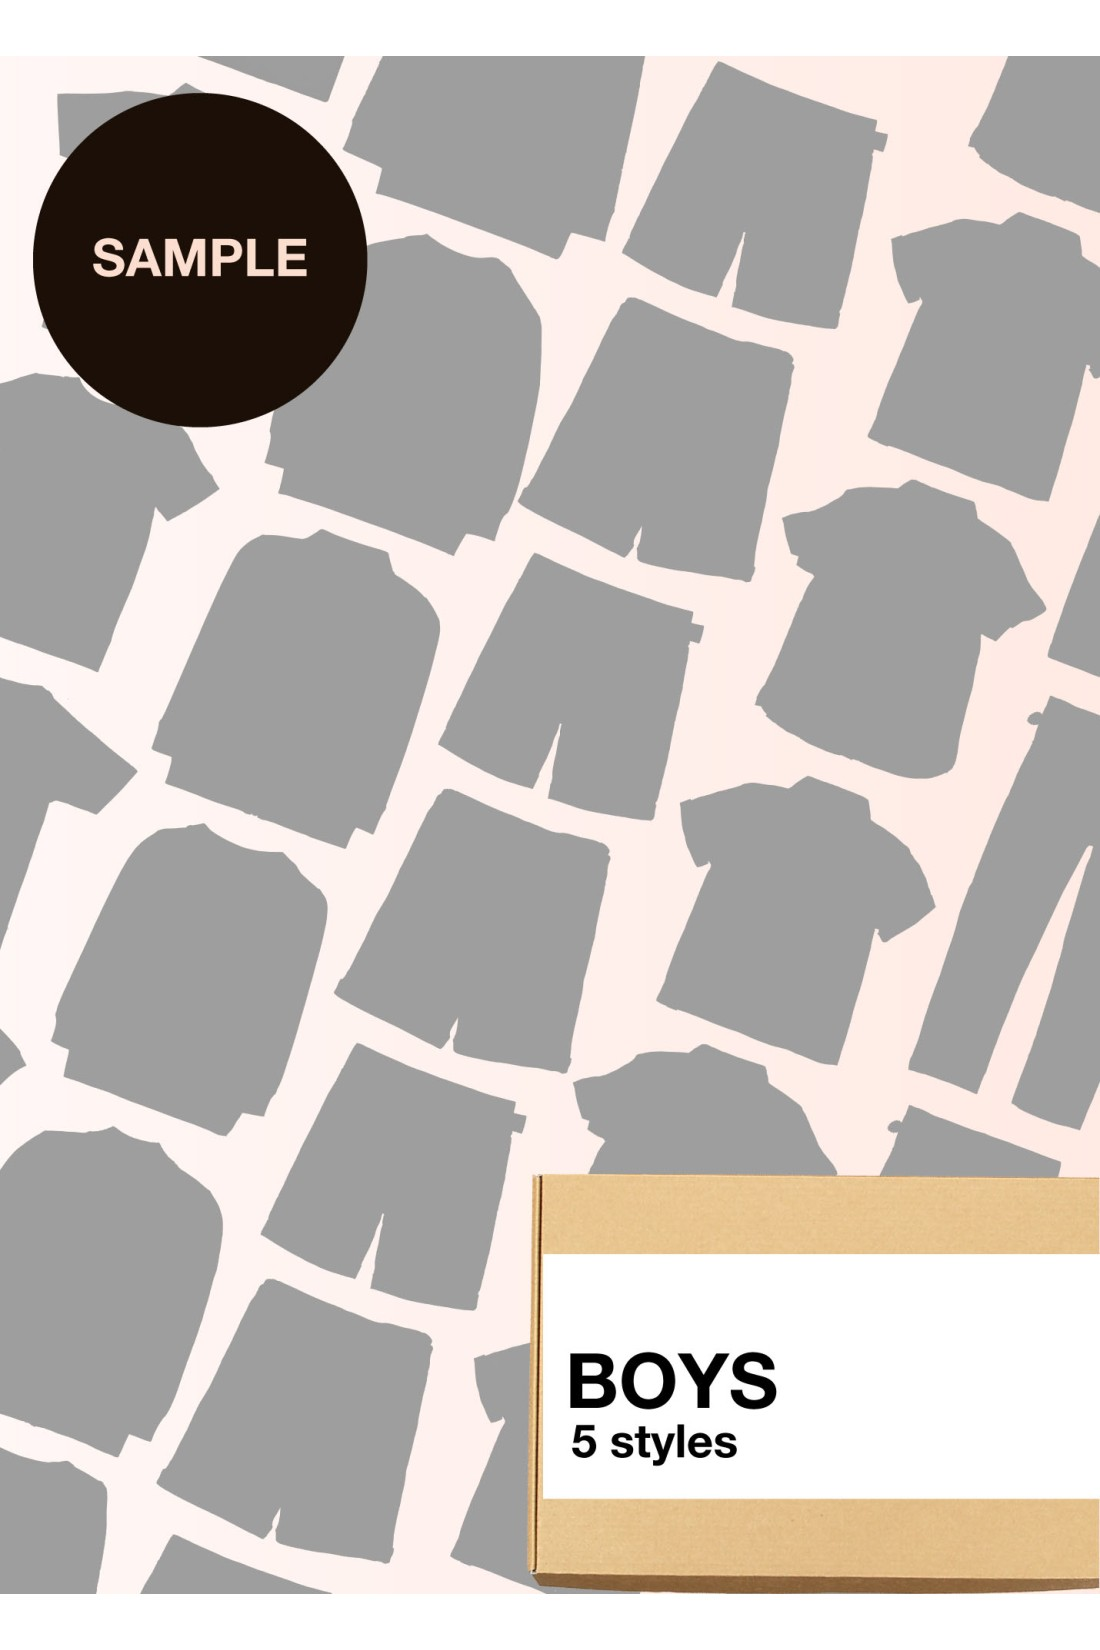 Sample Surprise Box Boys - 5 Styles